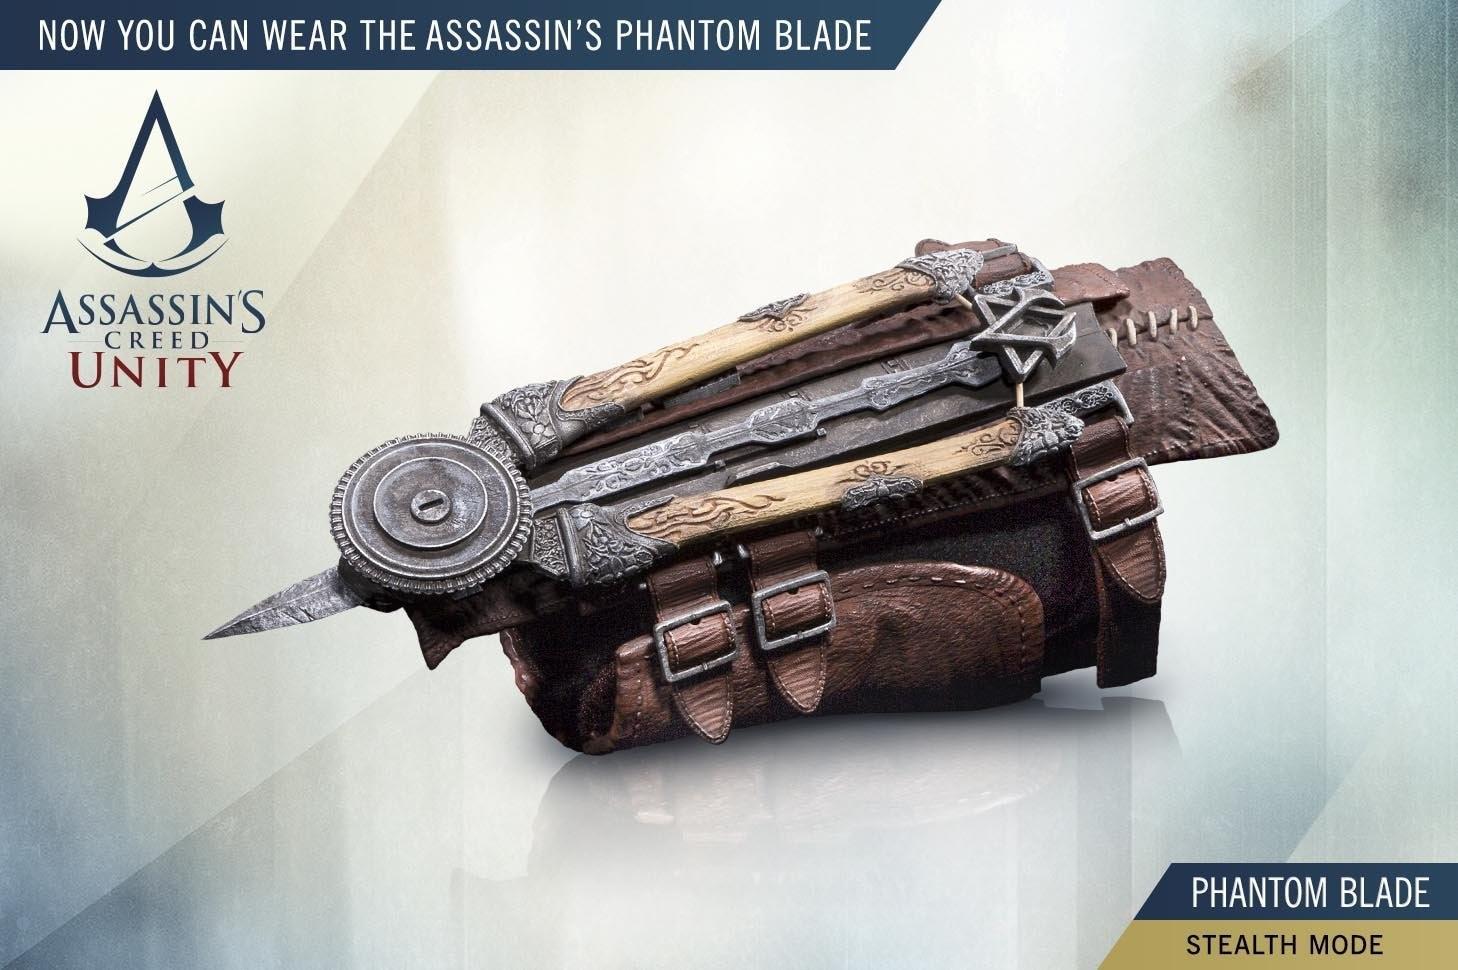 Assassin's Creed 5 Revolution Unity Sleeve Arrow Edward Kenway Sleeve Swords Sleeve Sword Garage Kit